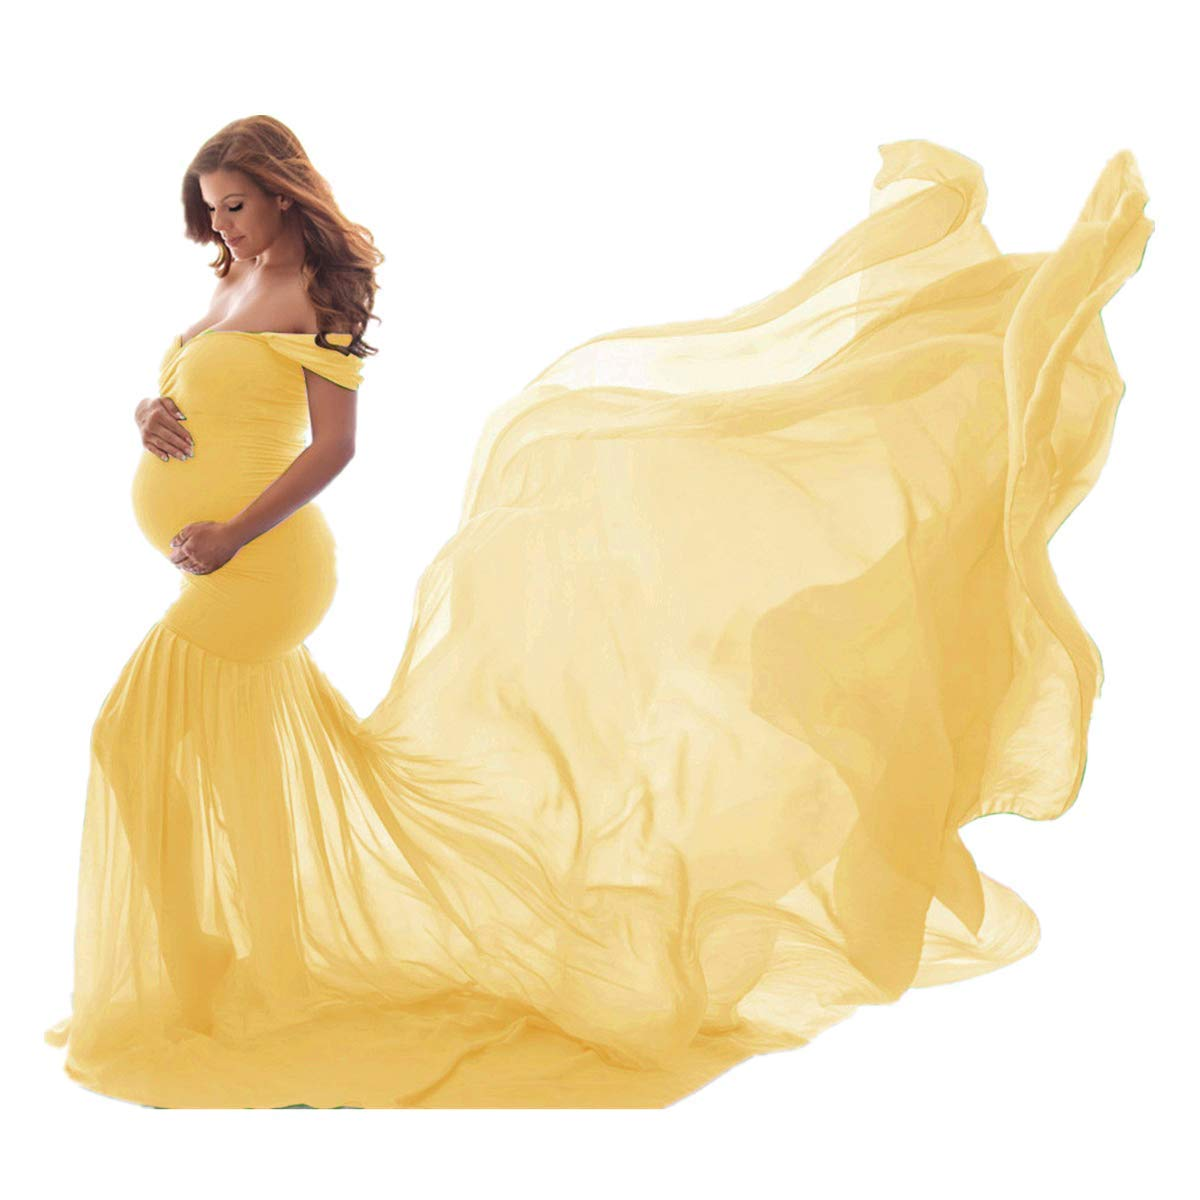 Floor Length Maternity Dresses Photography Maxi Dresses Chiffon Elegant Strapless Long Women Dress Maternity Fairy Dress Photos